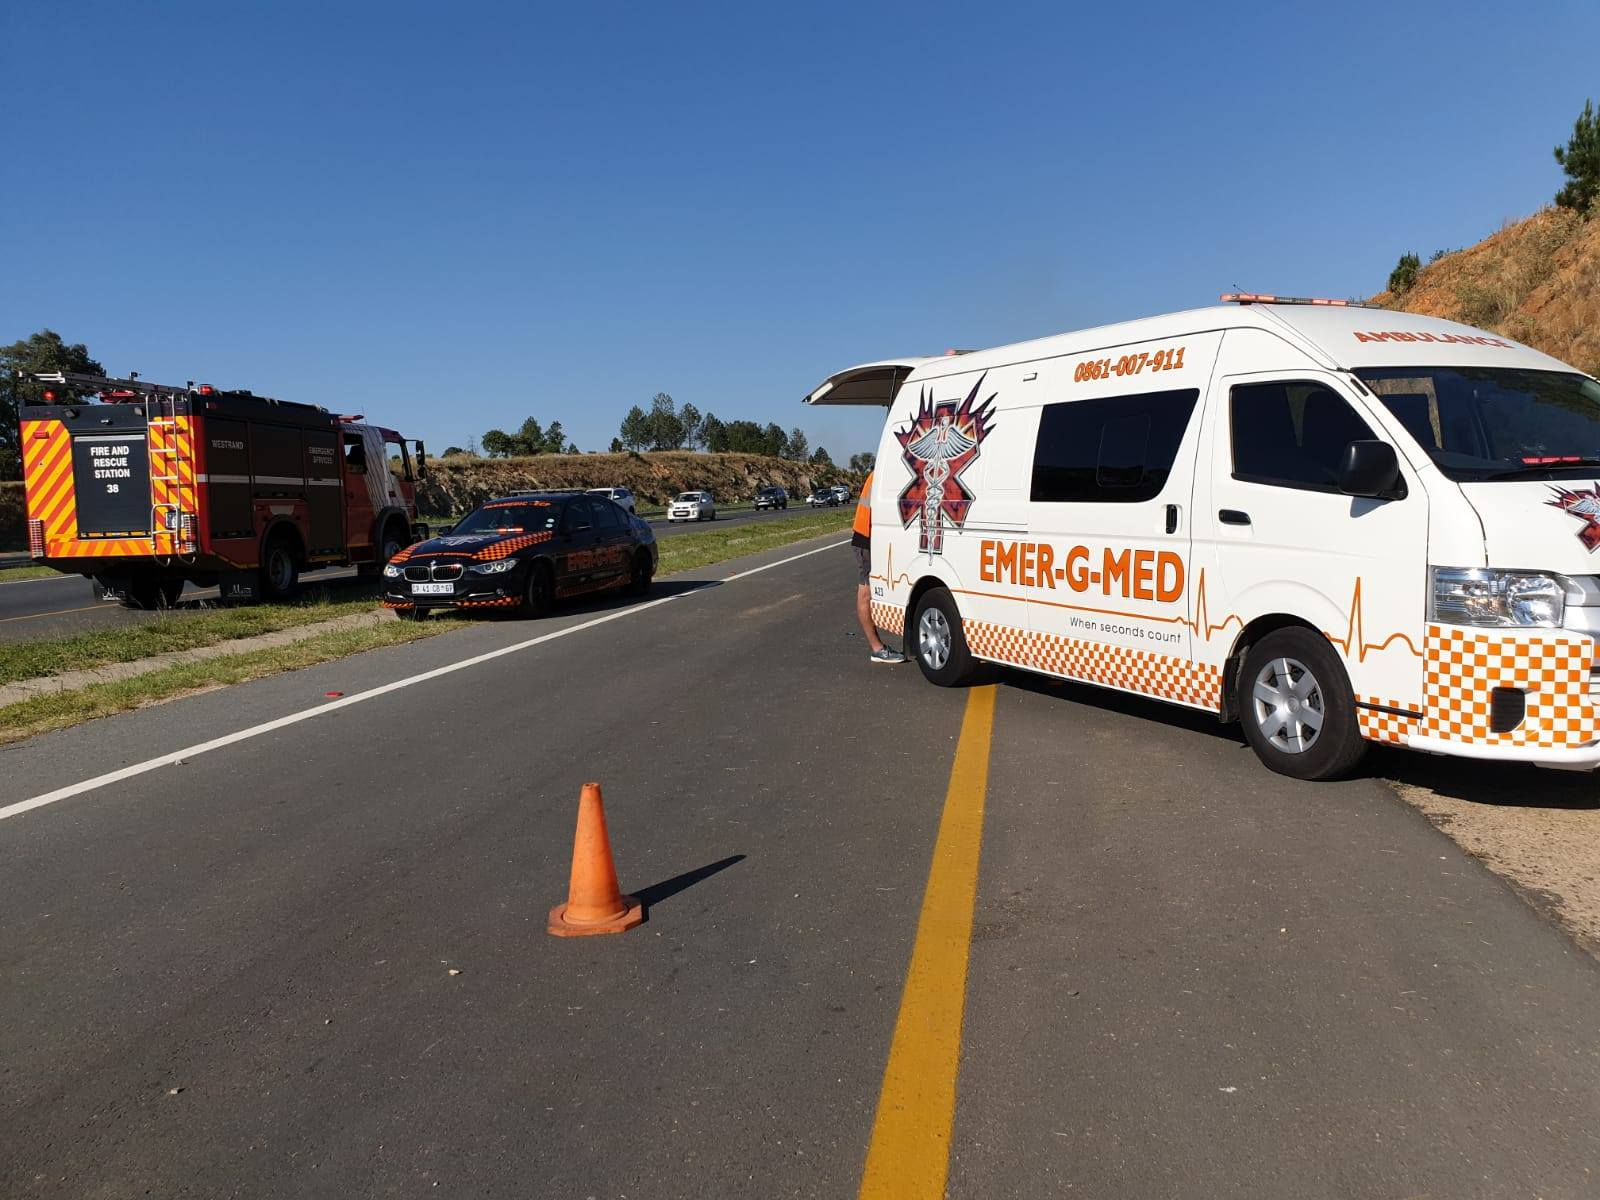 Several injured in road crash in Muldersdrift